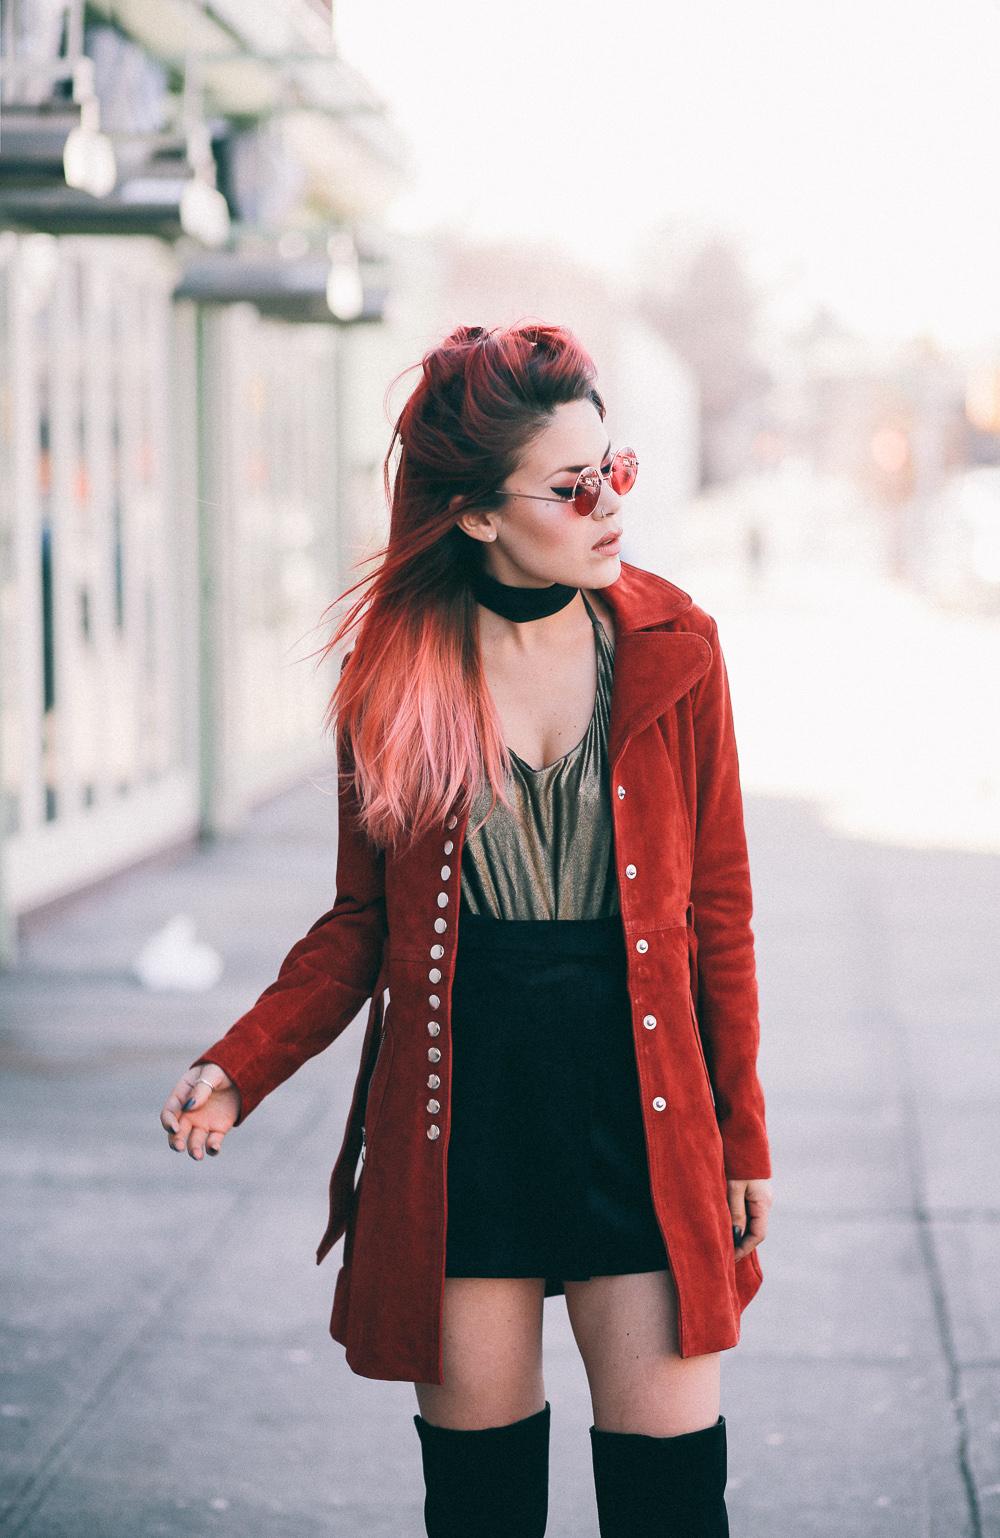 Le Happy wearing Nasty Gal retro suede coat and metallic bodysuit